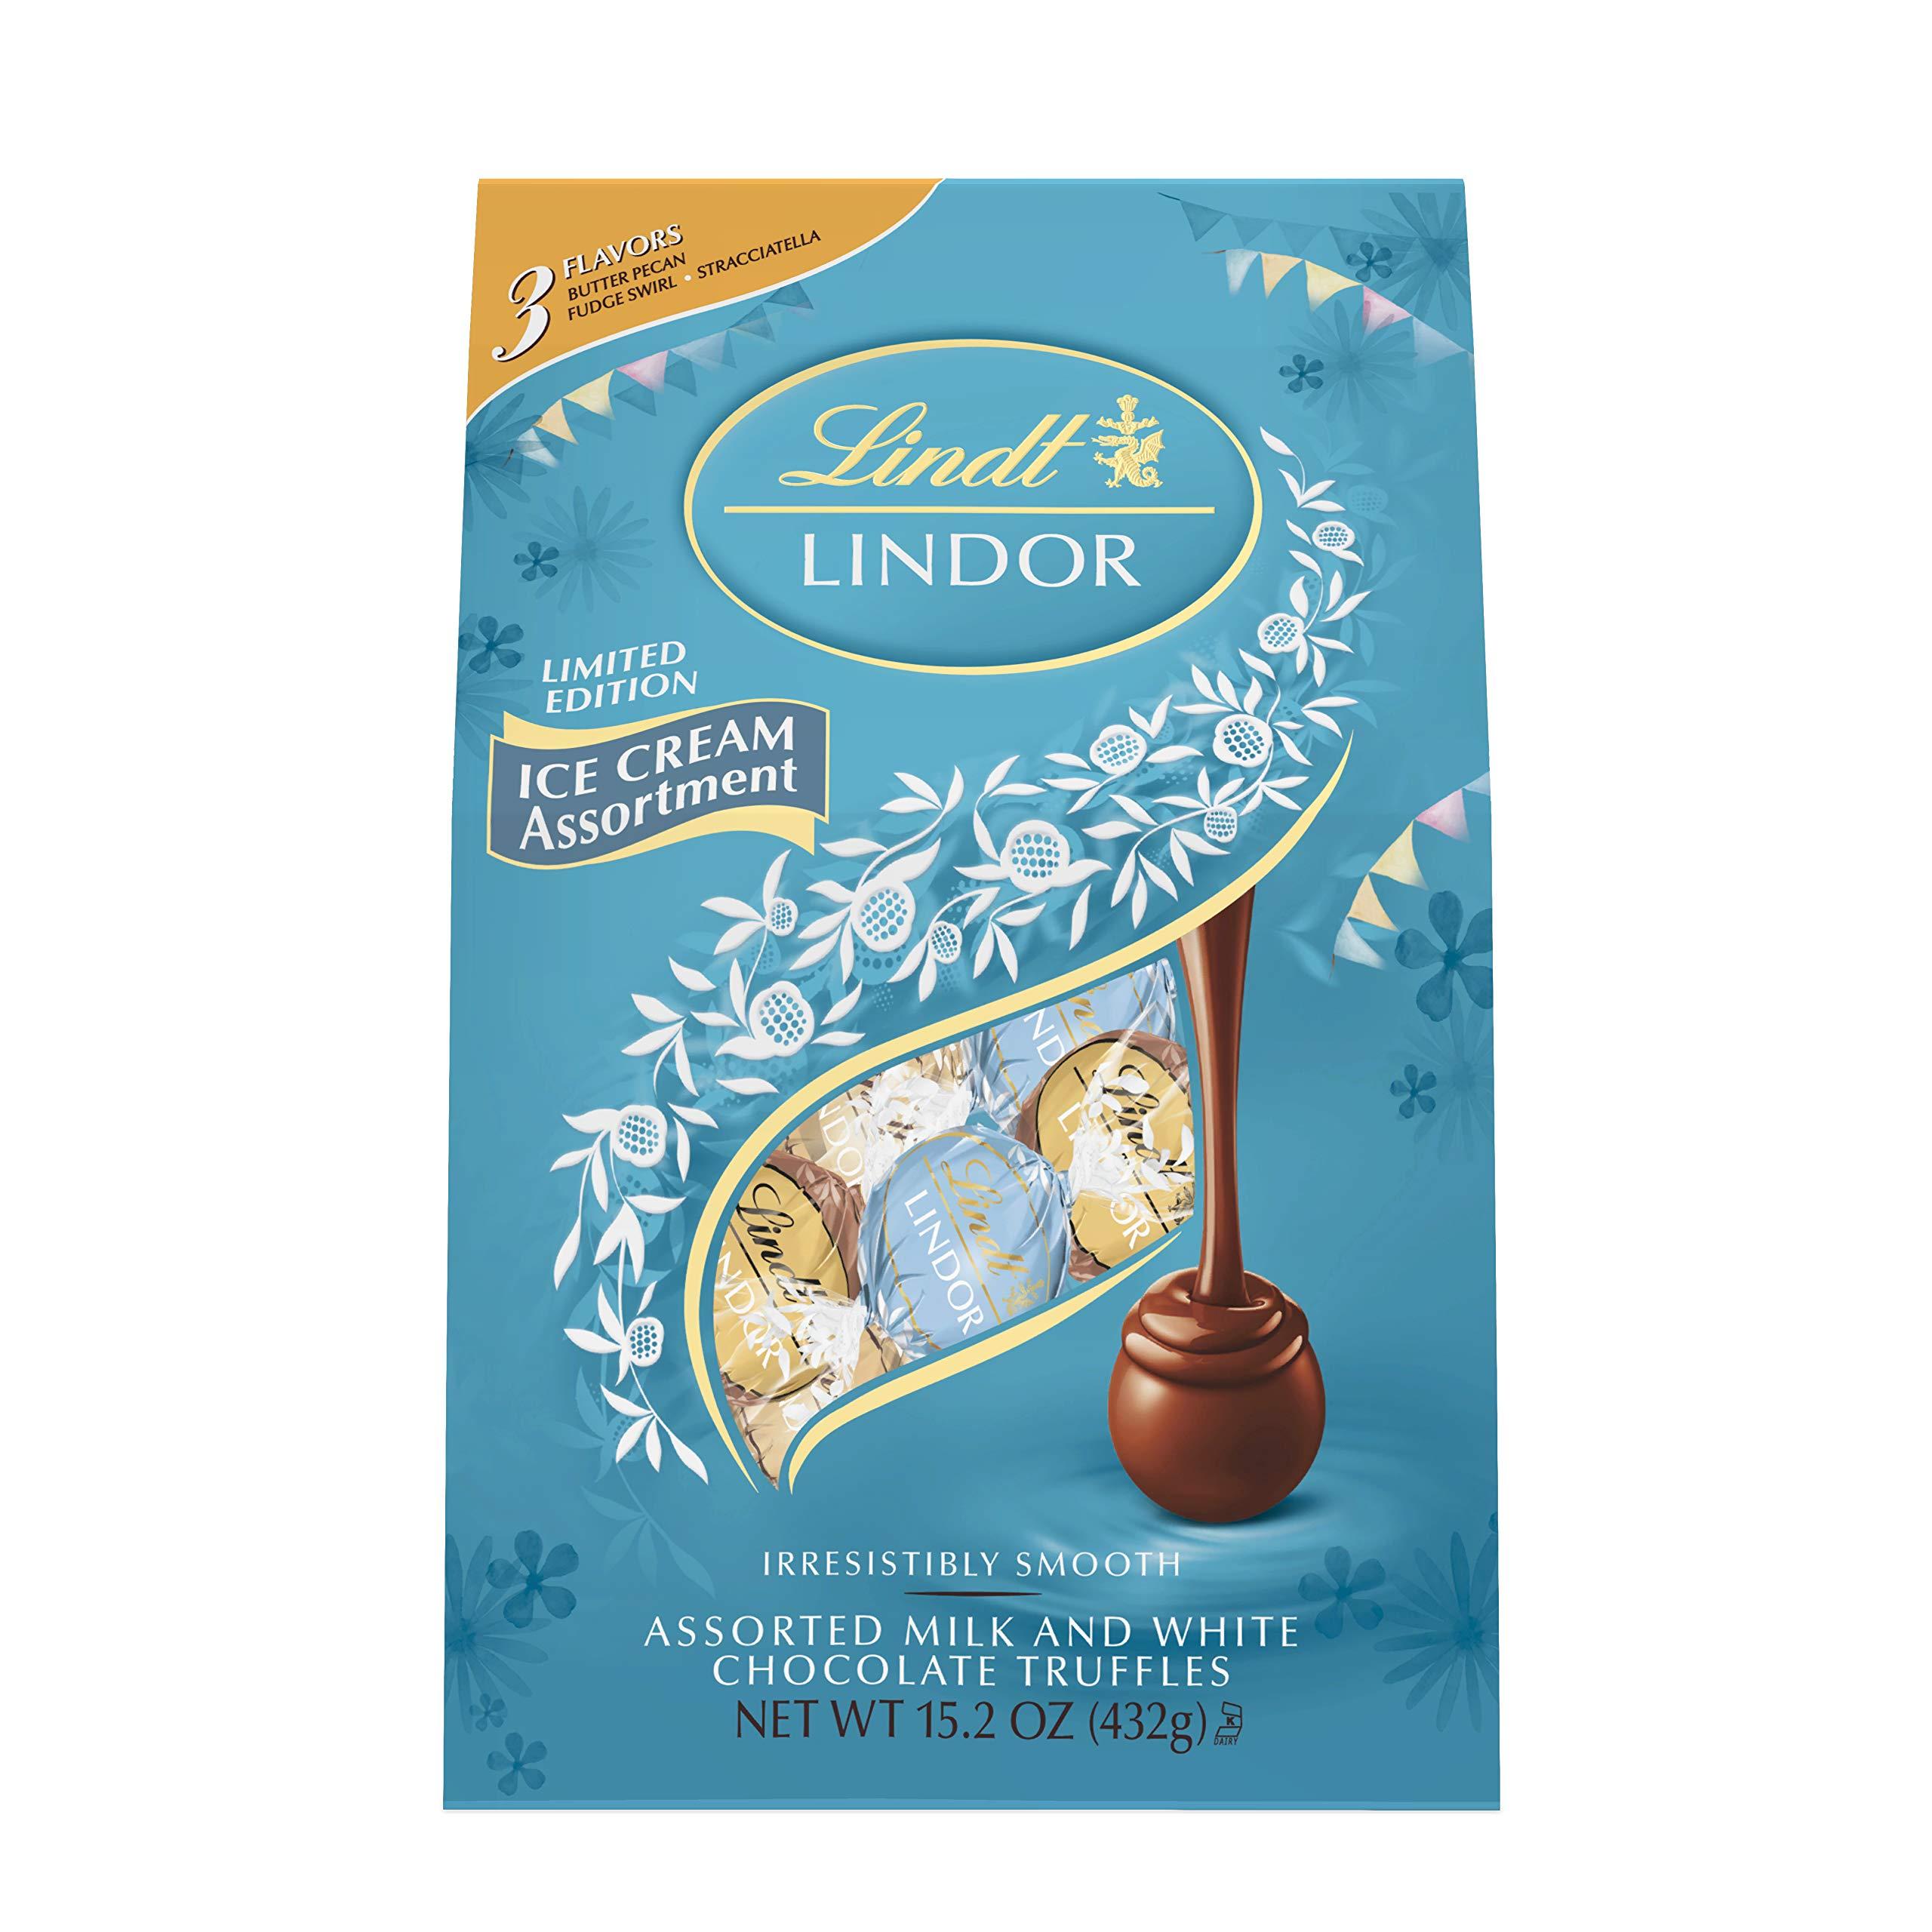 Lindt Lindor Ice Cream Themed Chocolate Truffles